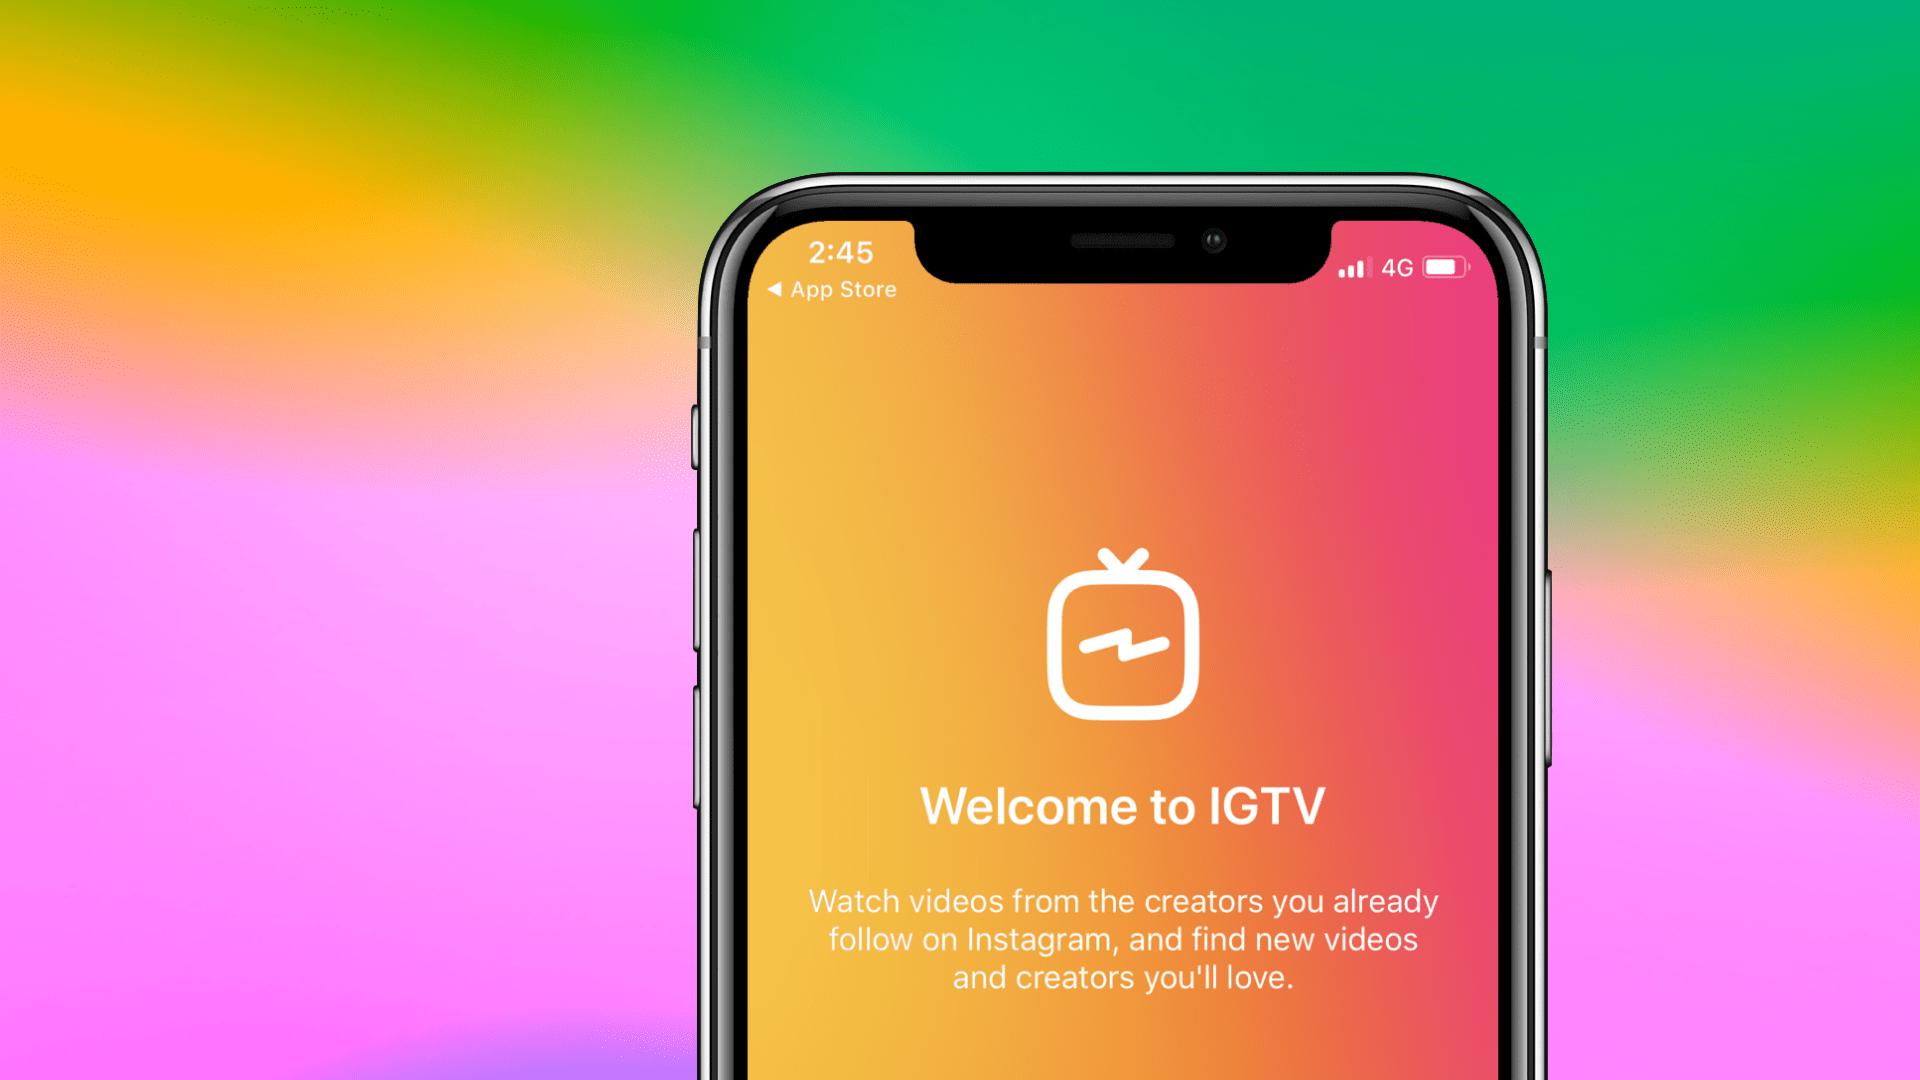 IGTV-iPhone-app.png